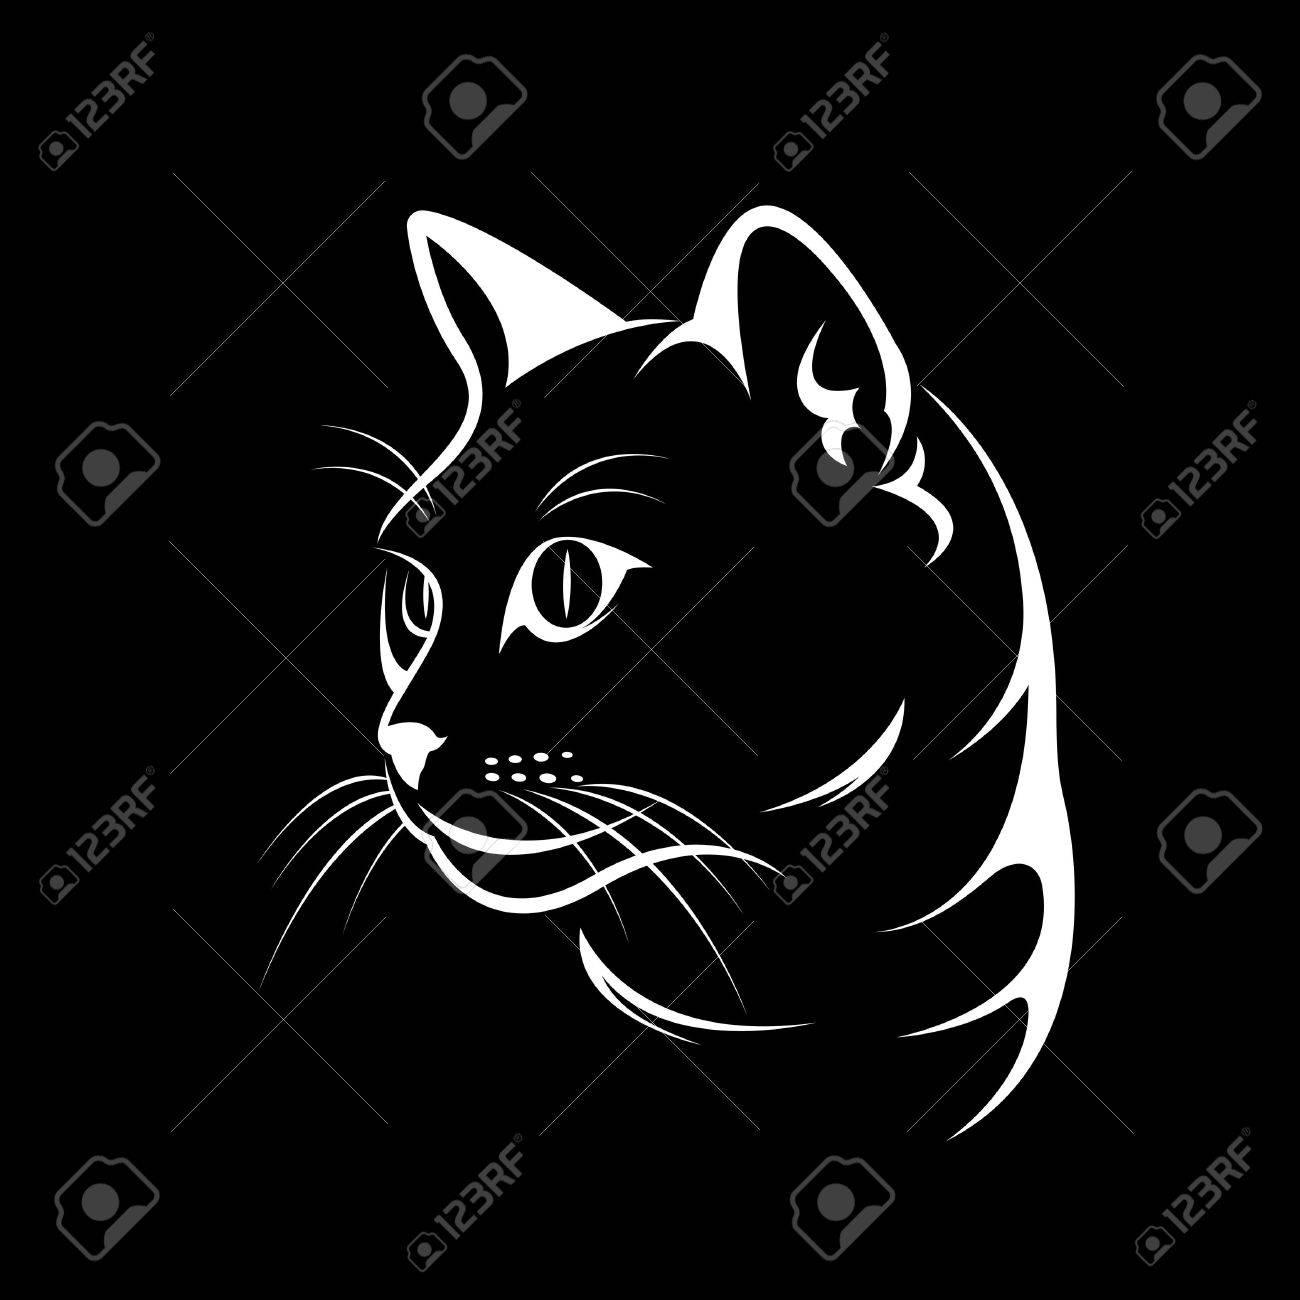 Vector of a cat face design on black background, Vector illustration. Pet - 72271121